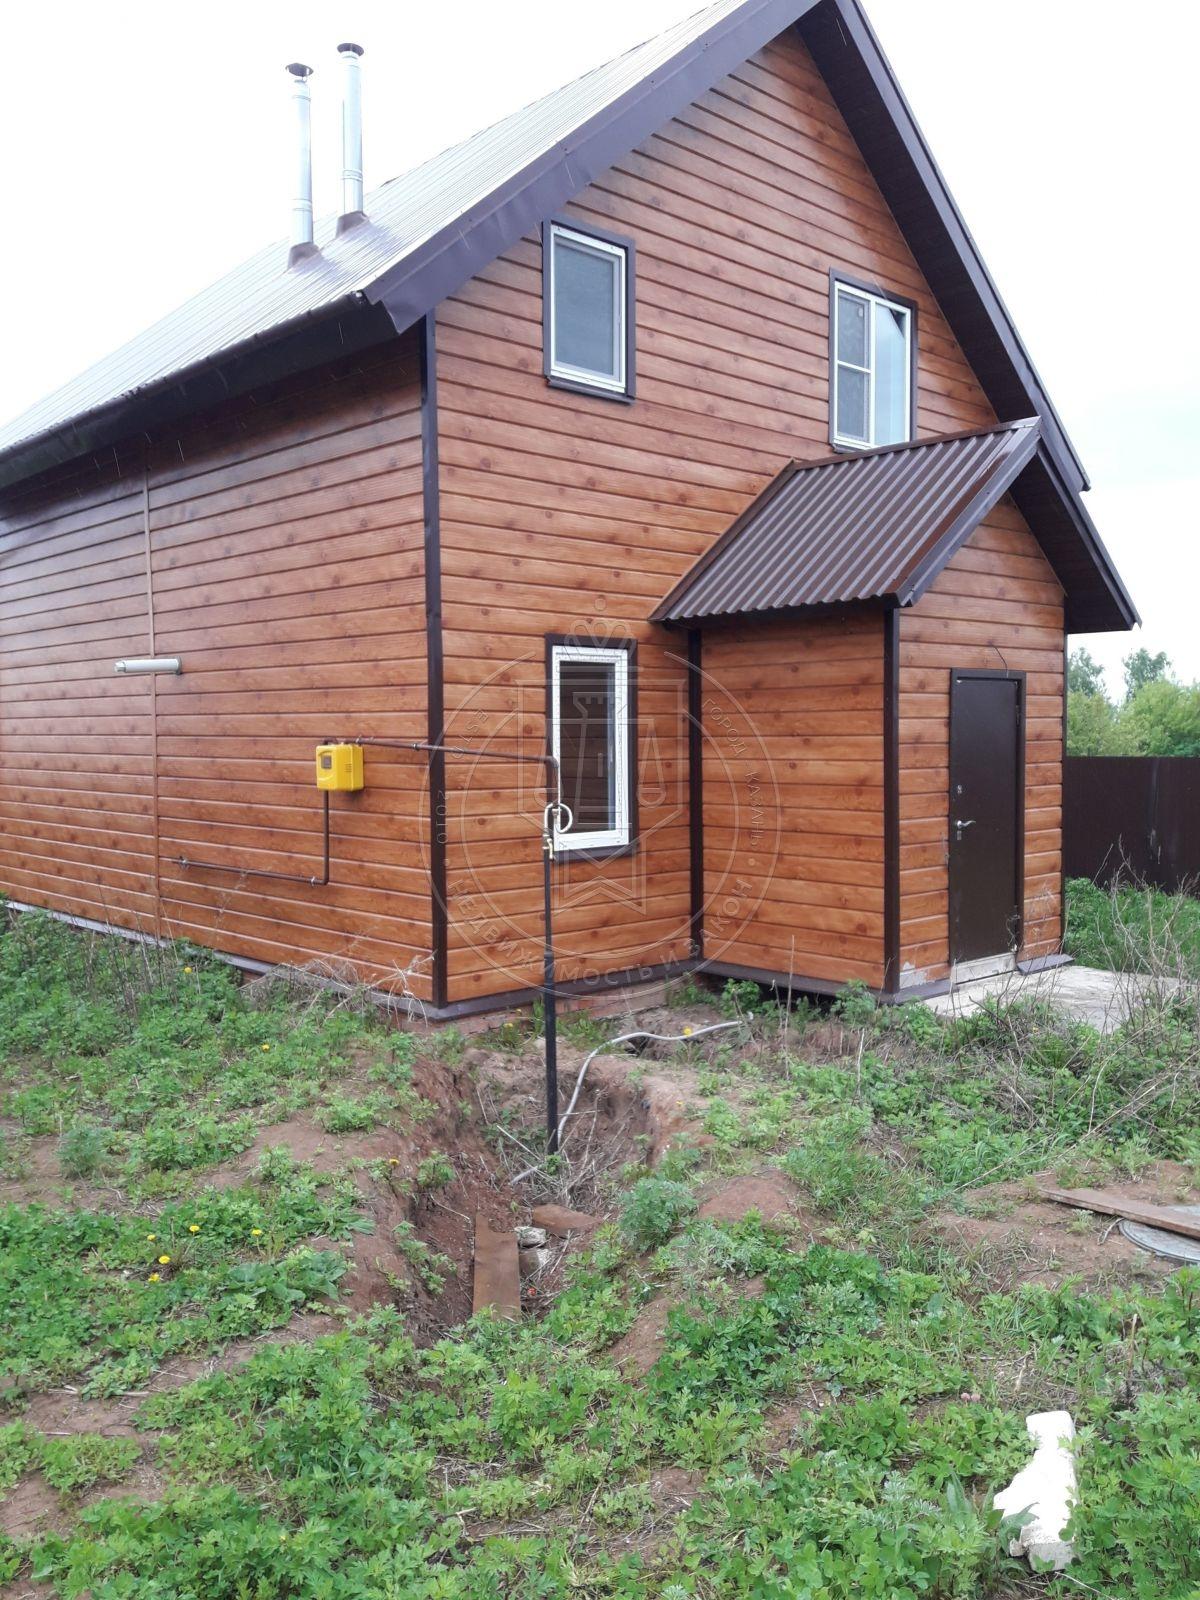 Продажа  дома п. Куюки, ул Центральная, 100.0 м² (миниатюра №1)